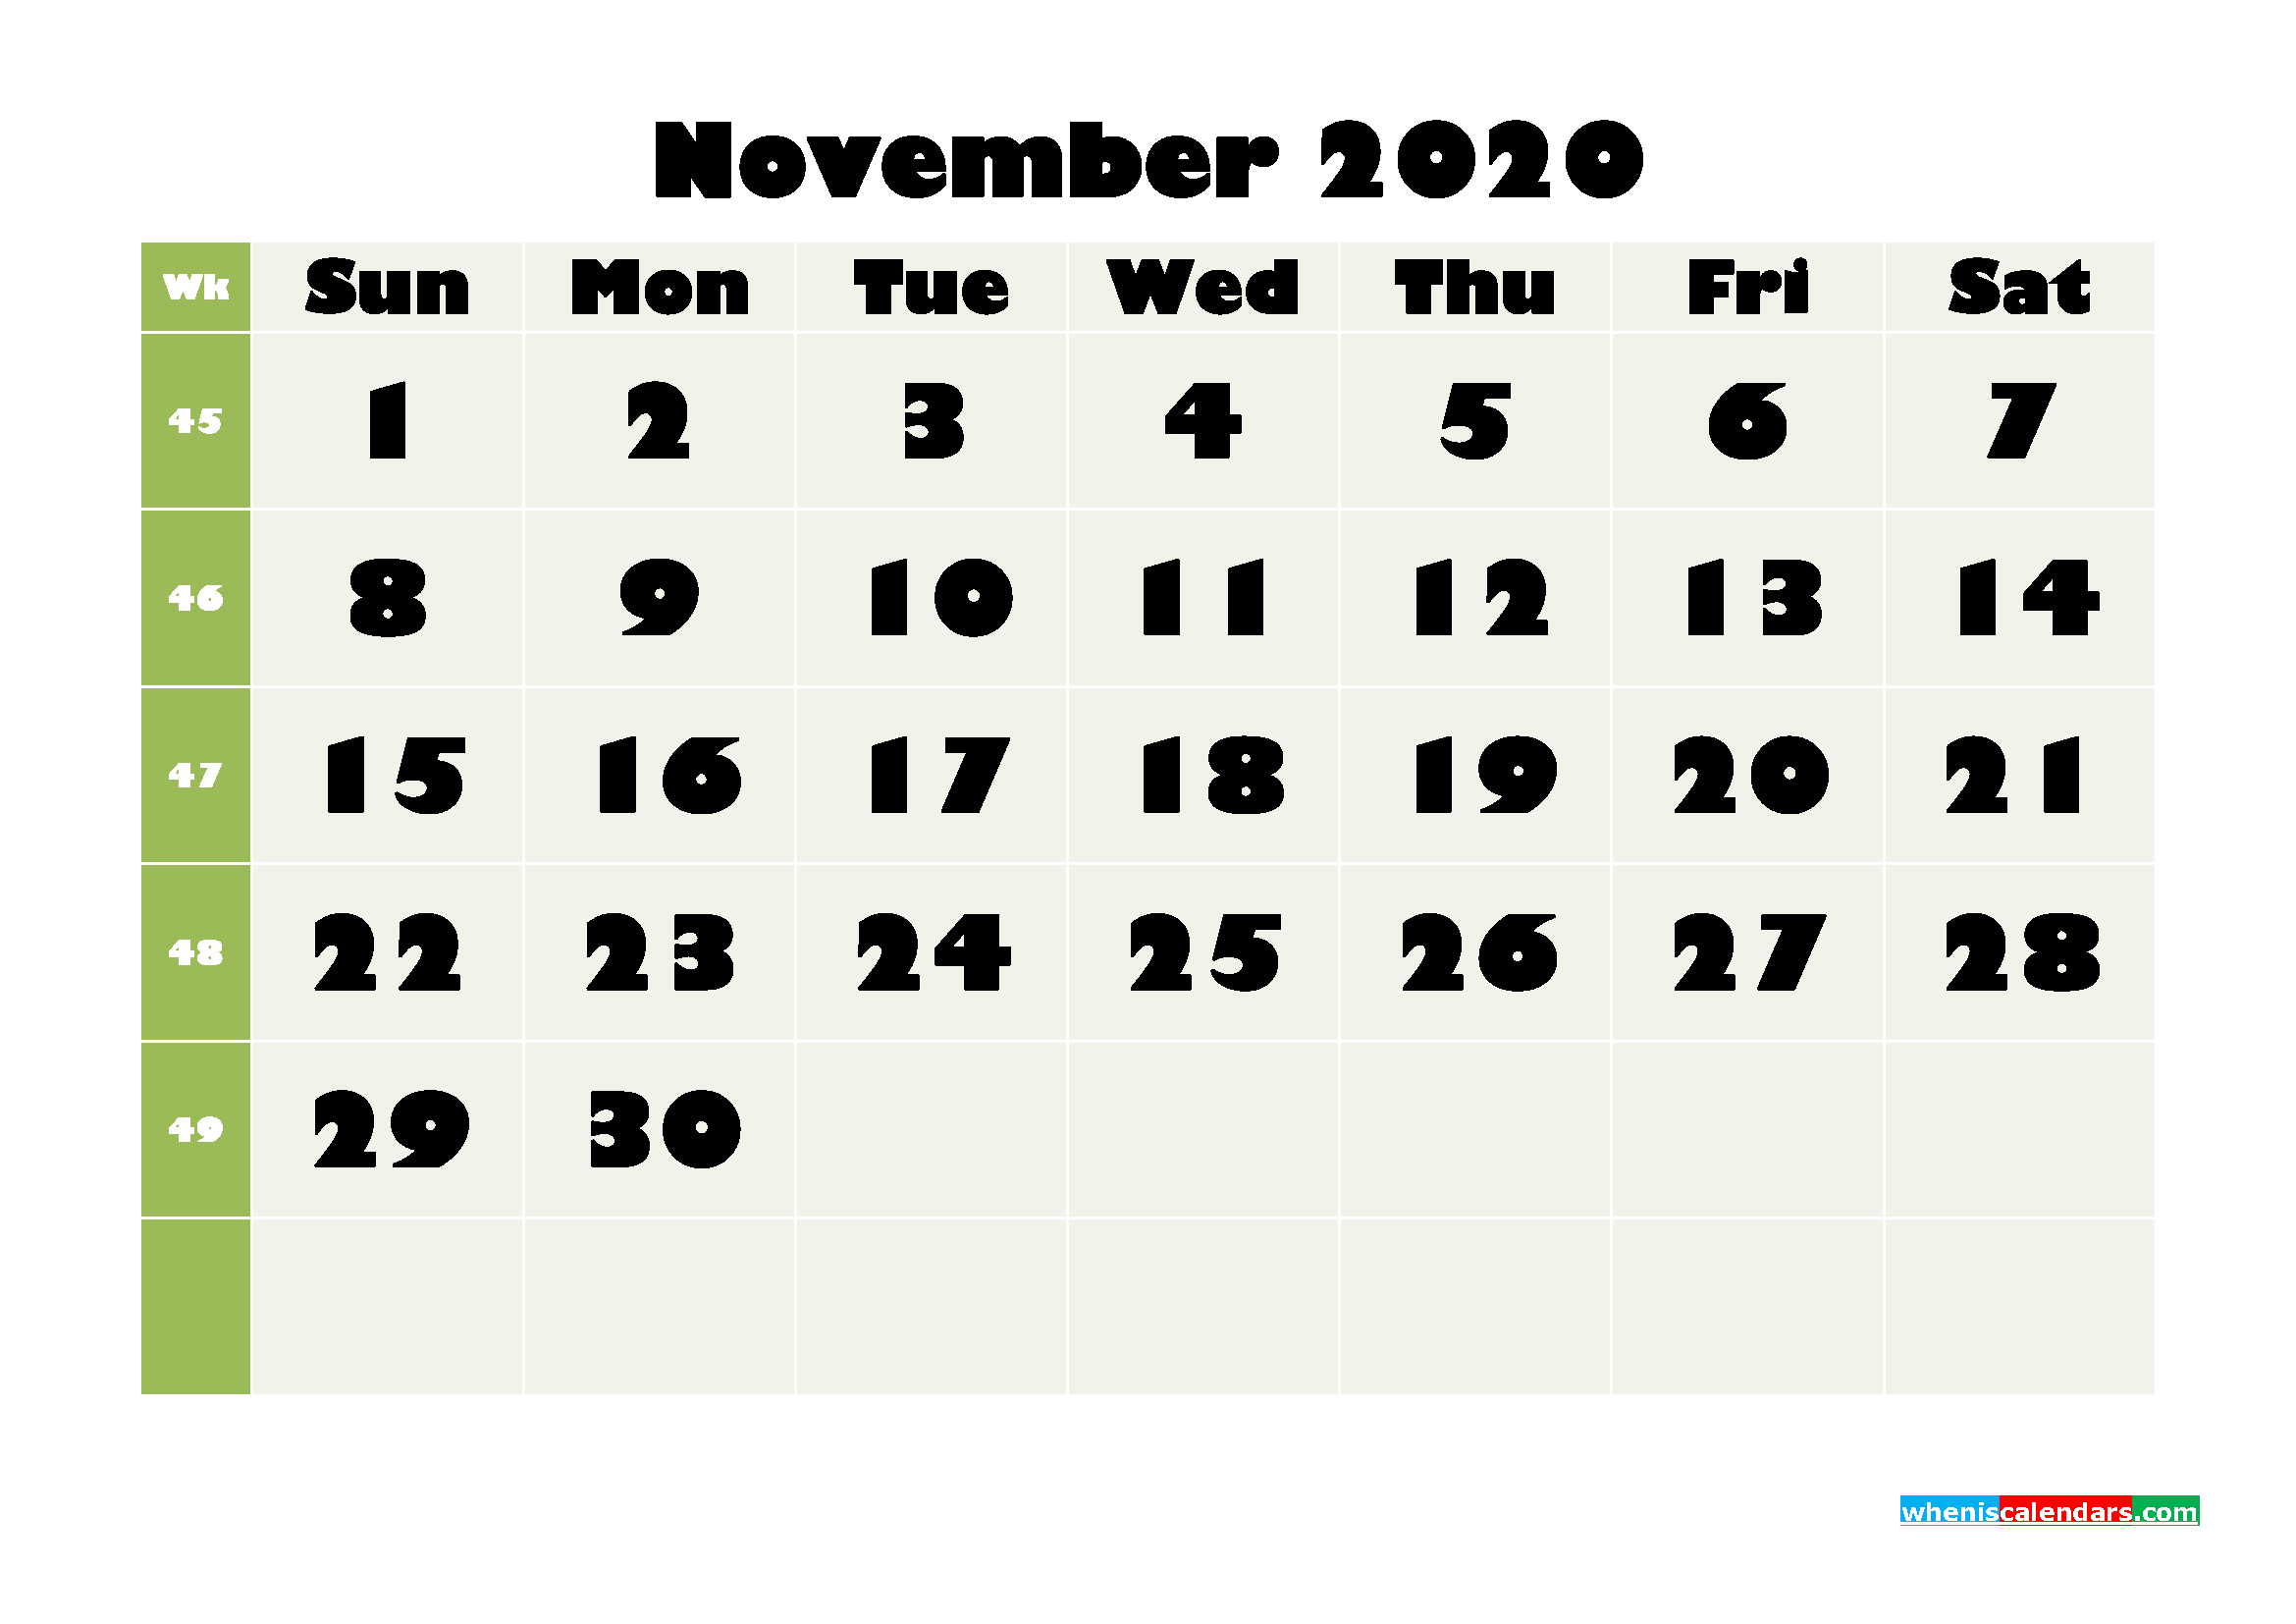 November Printable Calendar 2020 PDF, Word - No.m20b671